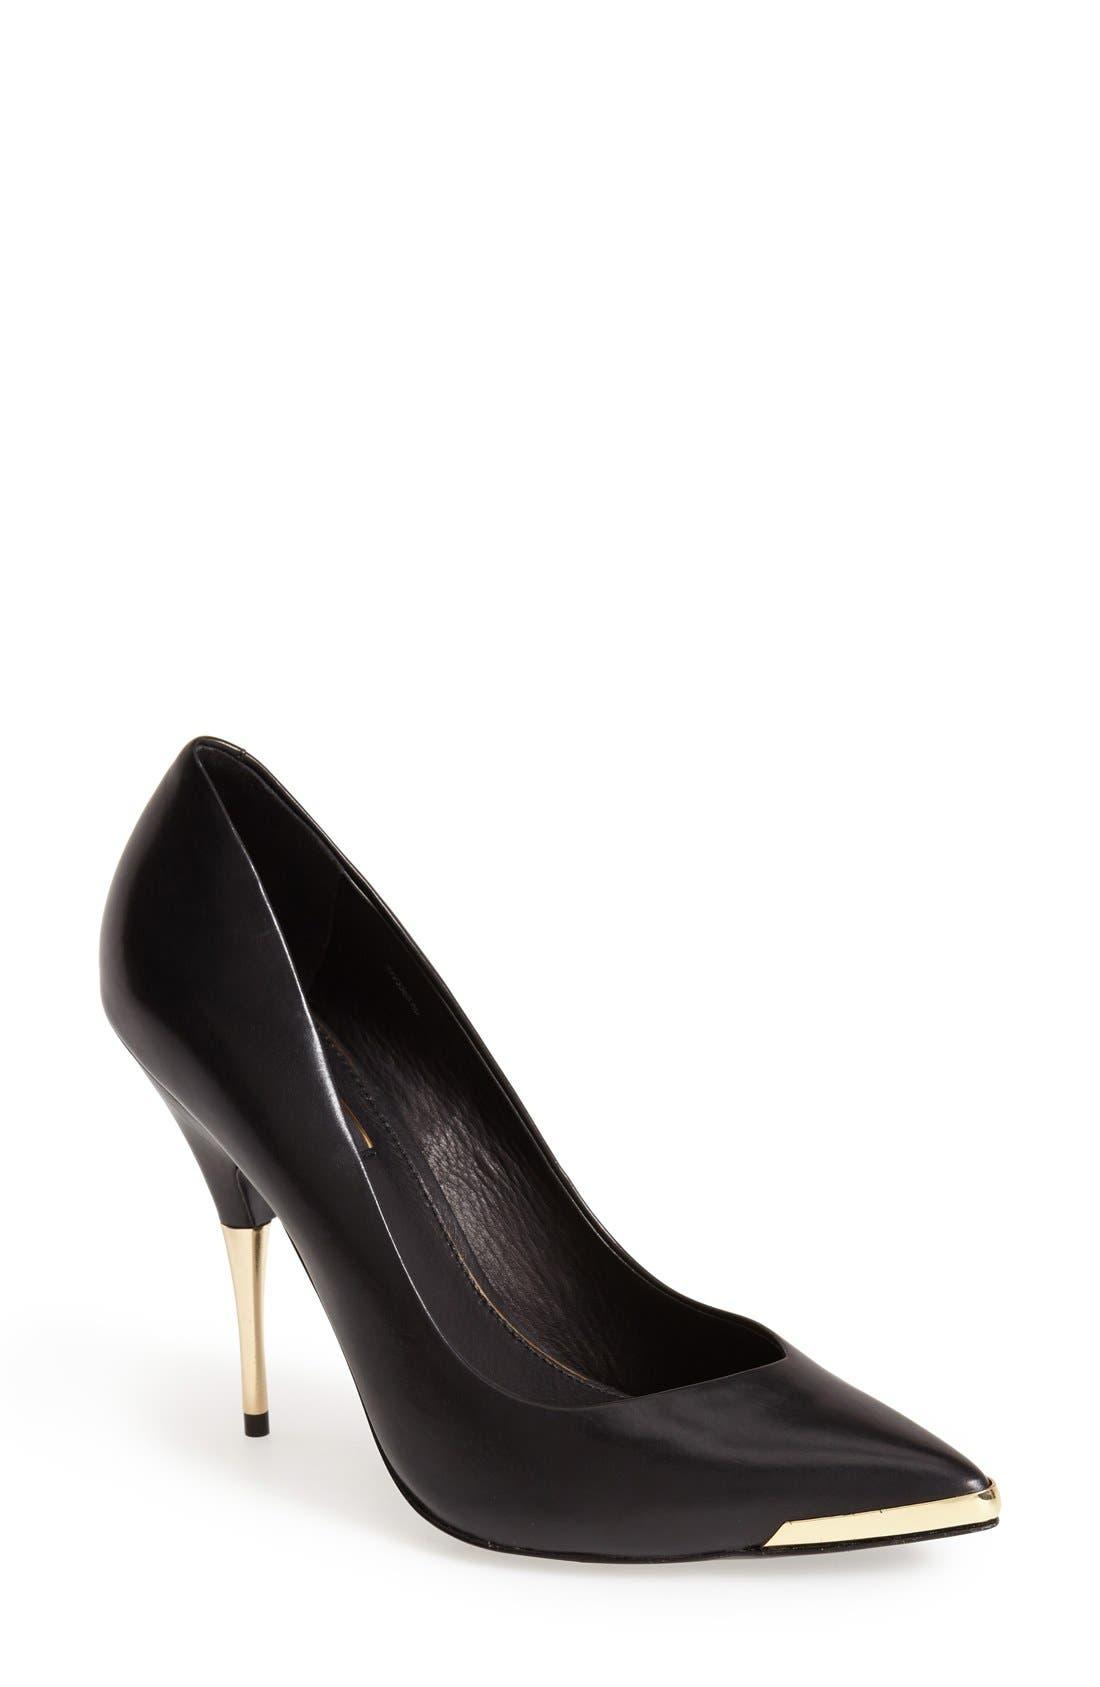 Alternate Image 1 Selected - Rachel Zoe 'Carina' Leather Pointy Toe Pump (Women)